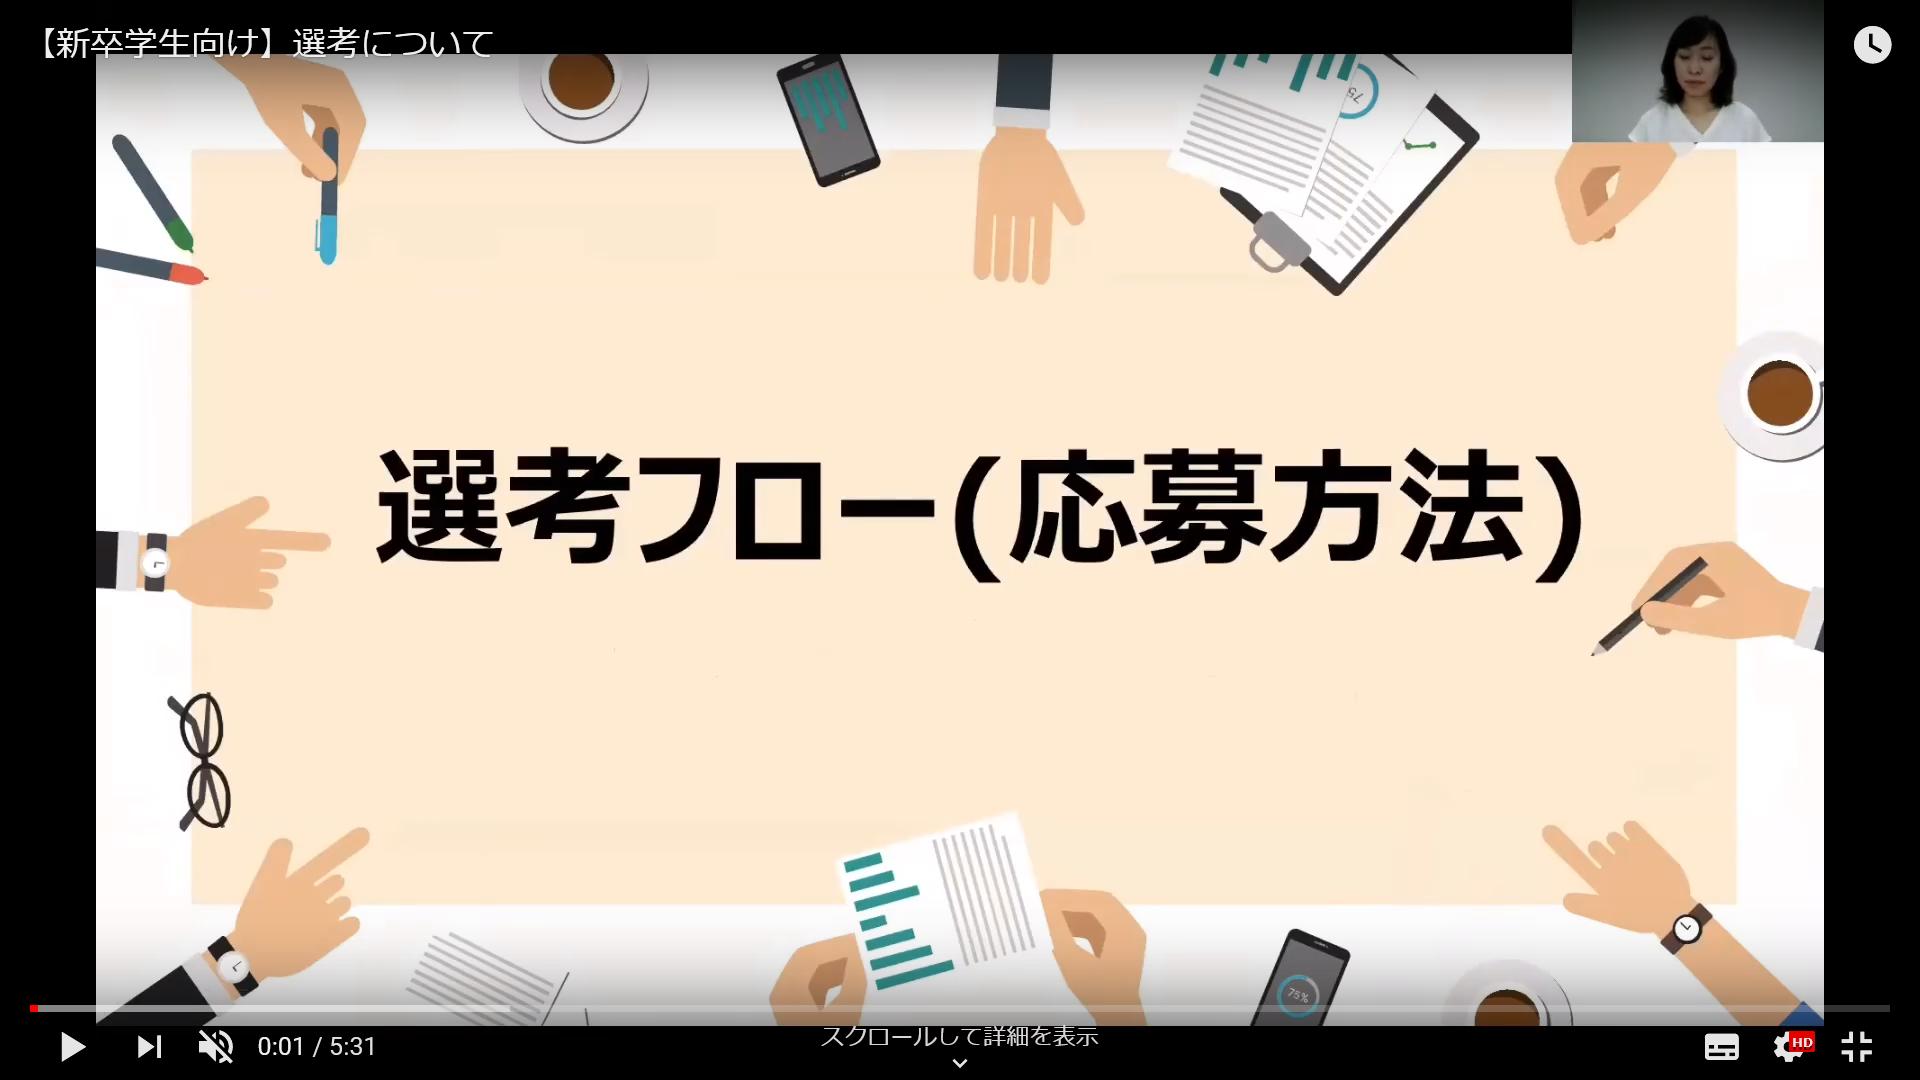 青藍会グループ採用情報 RECRUIT VIDEO